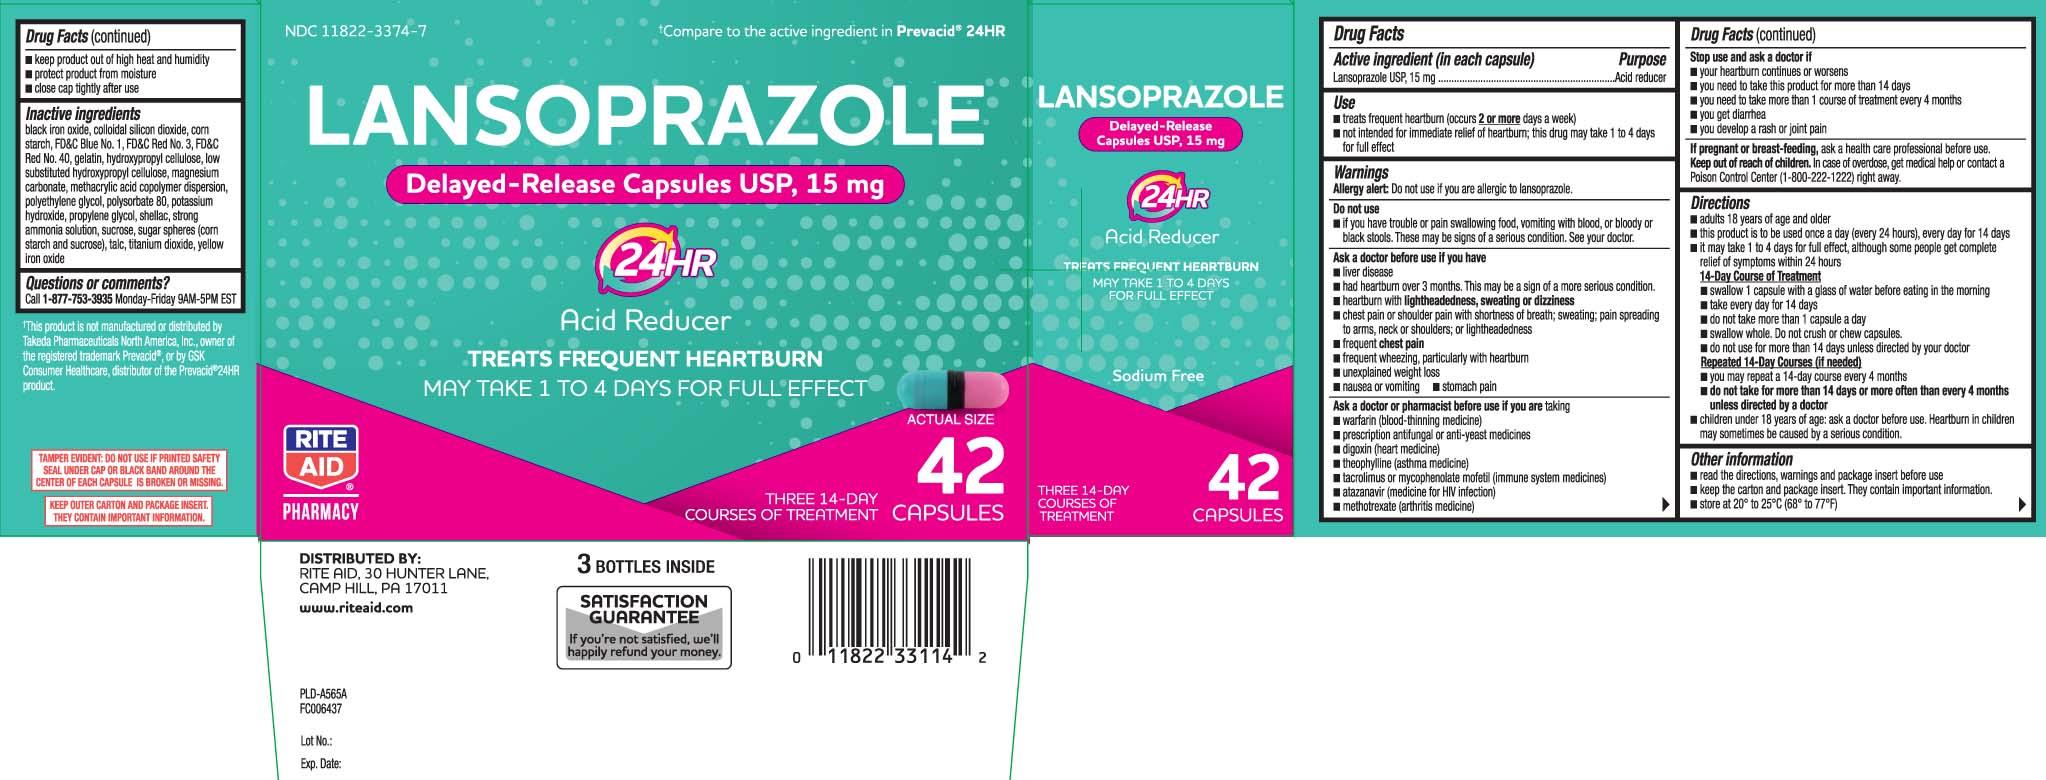 Lansoprazole USP, 15 mg